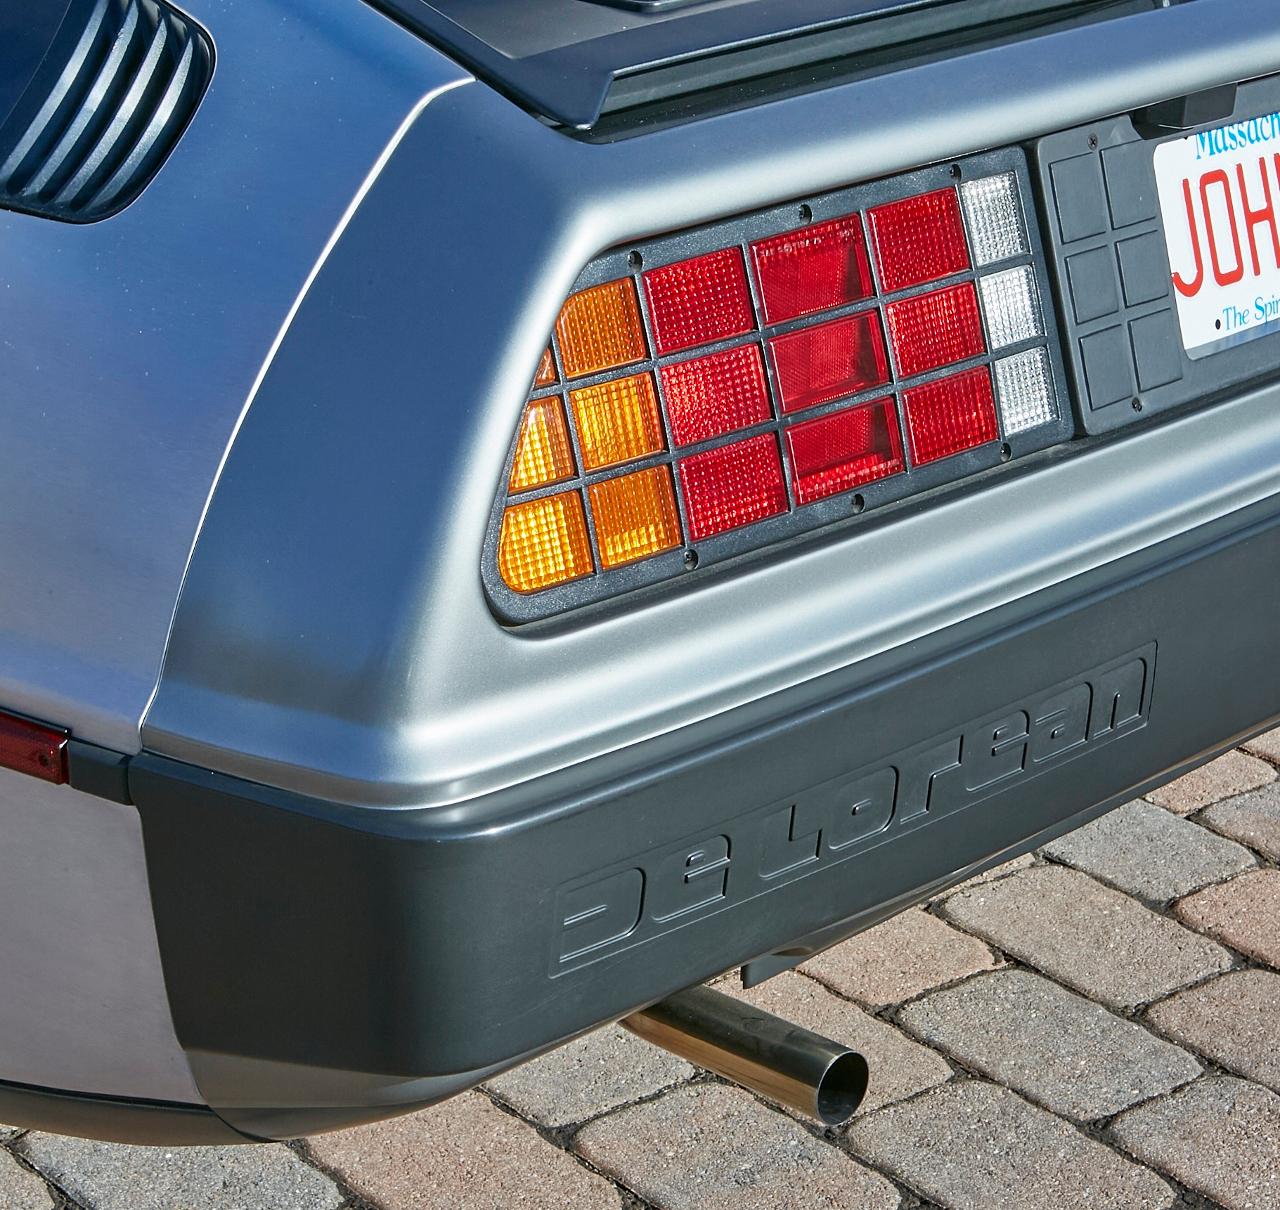 1981 DeLorean DMC-12 5-Speed taillight detail close